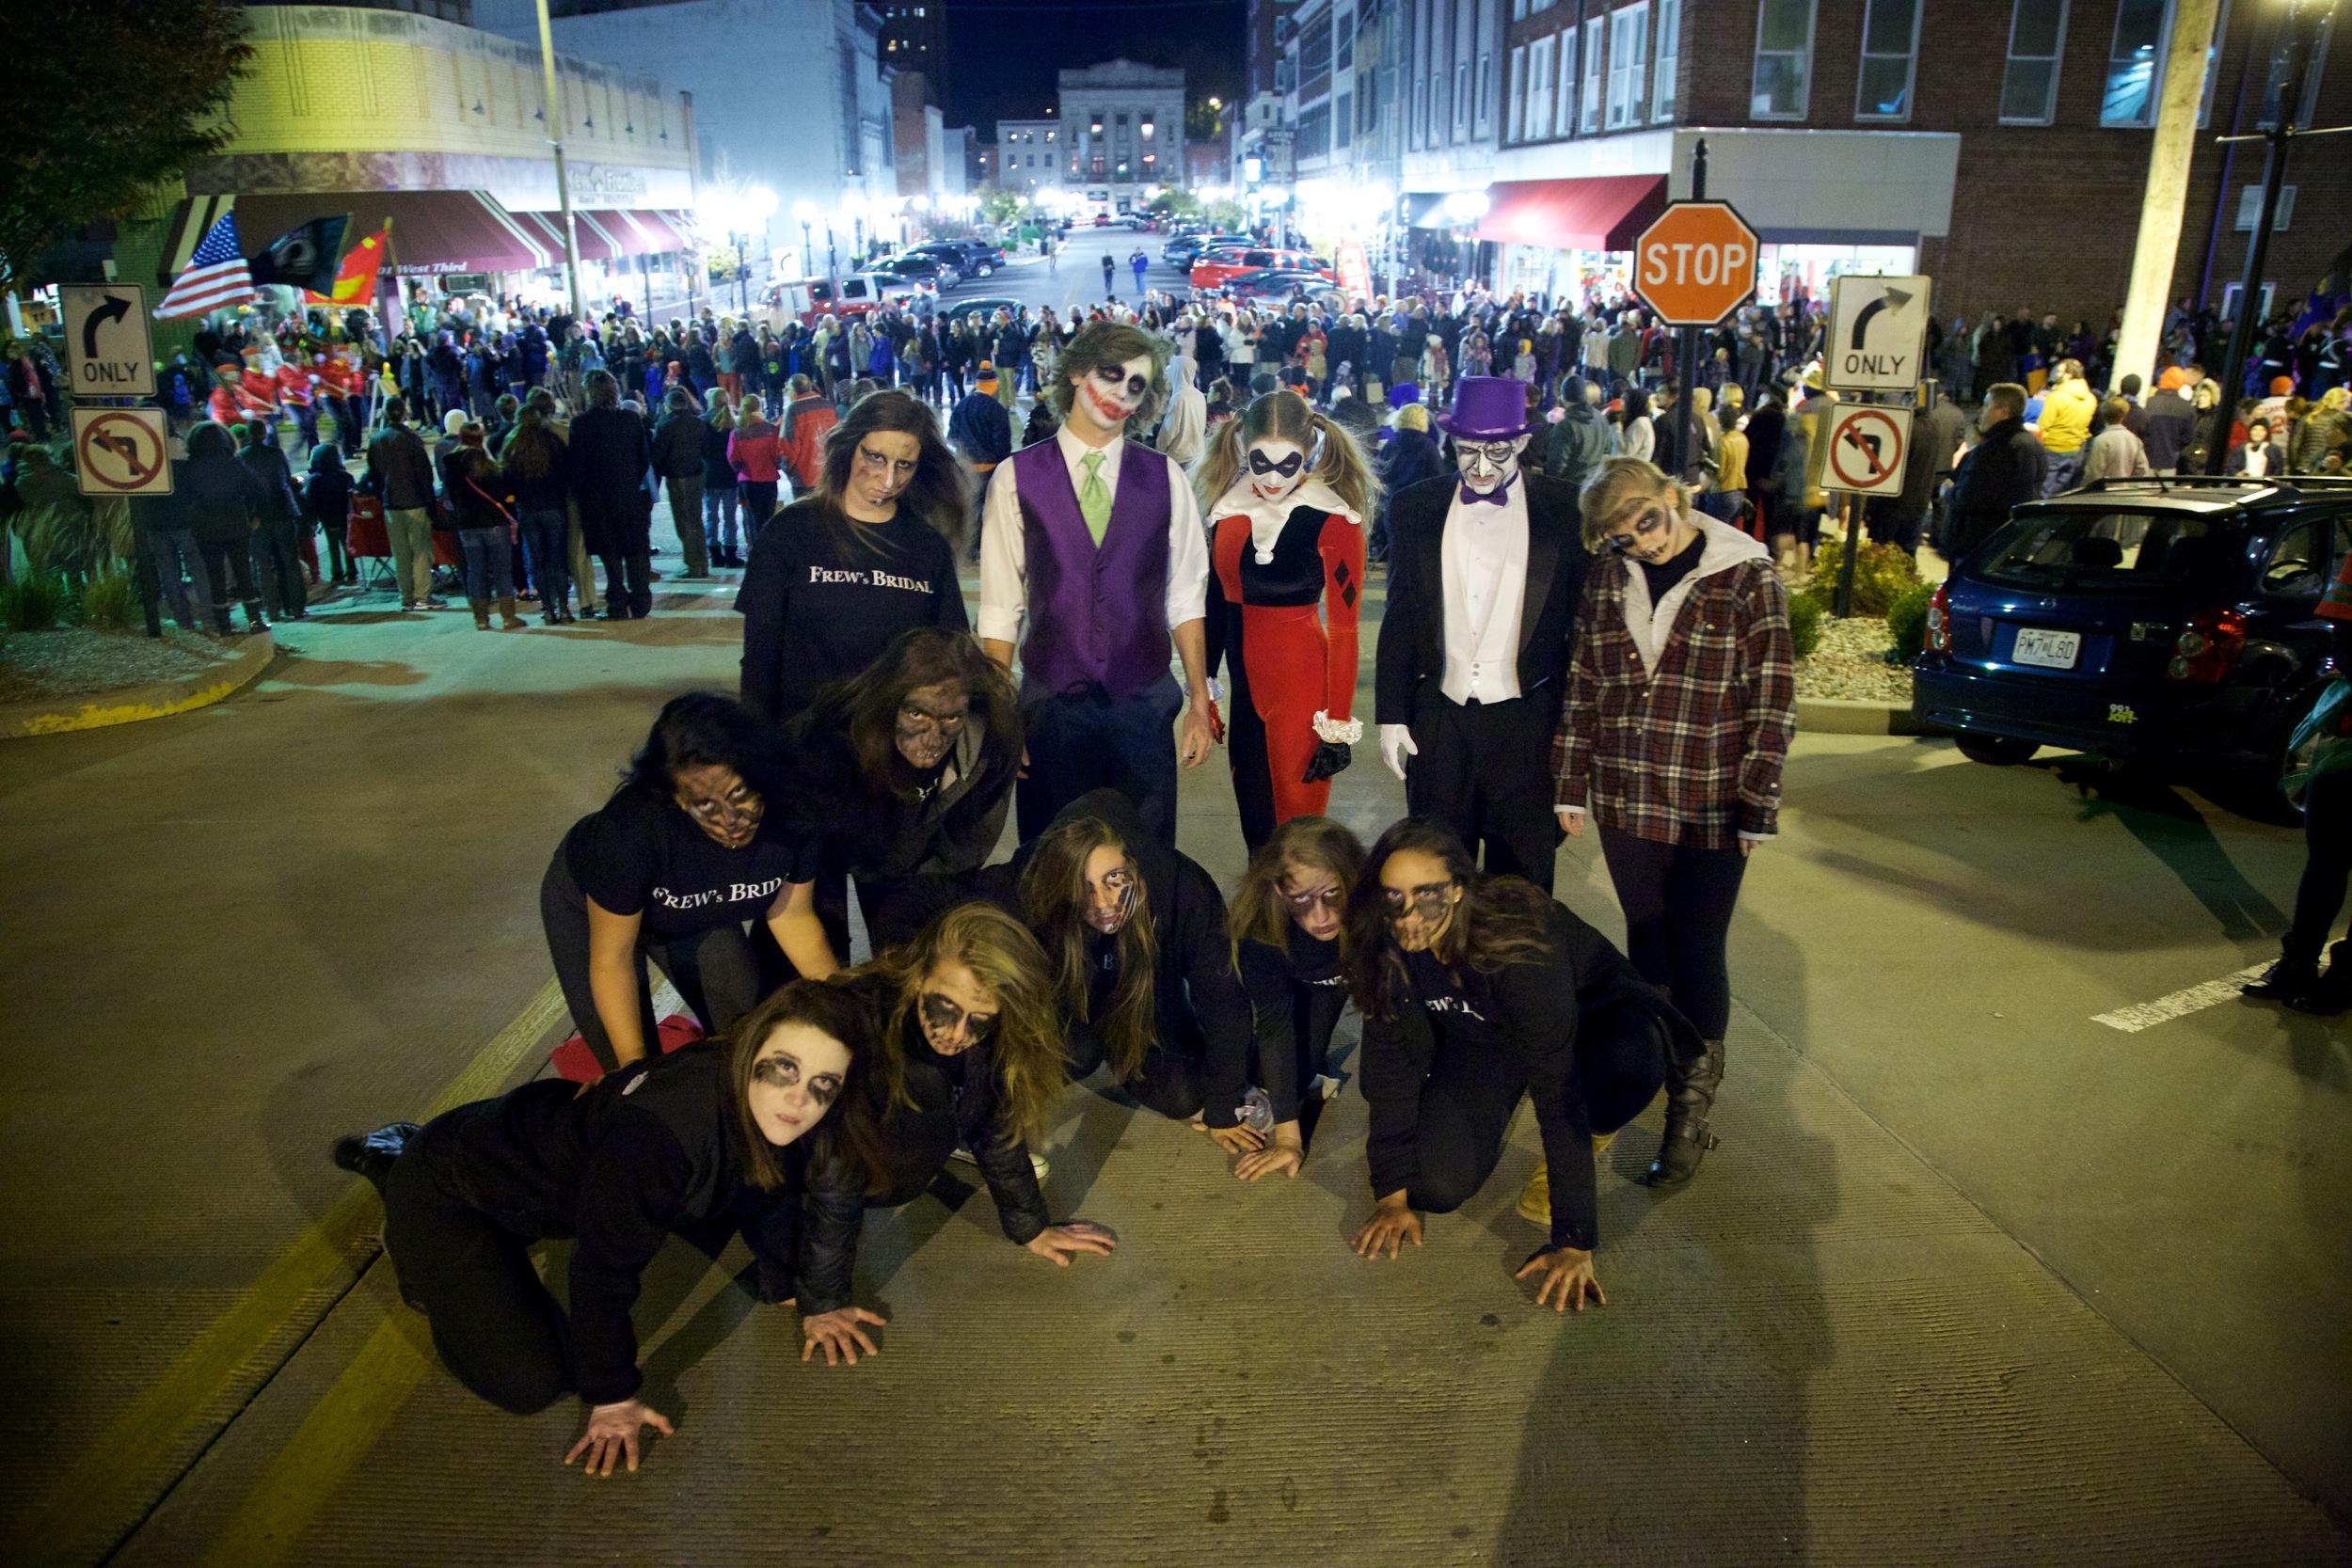 Several of the mannequins/dancers Jason Wissman is the Joker